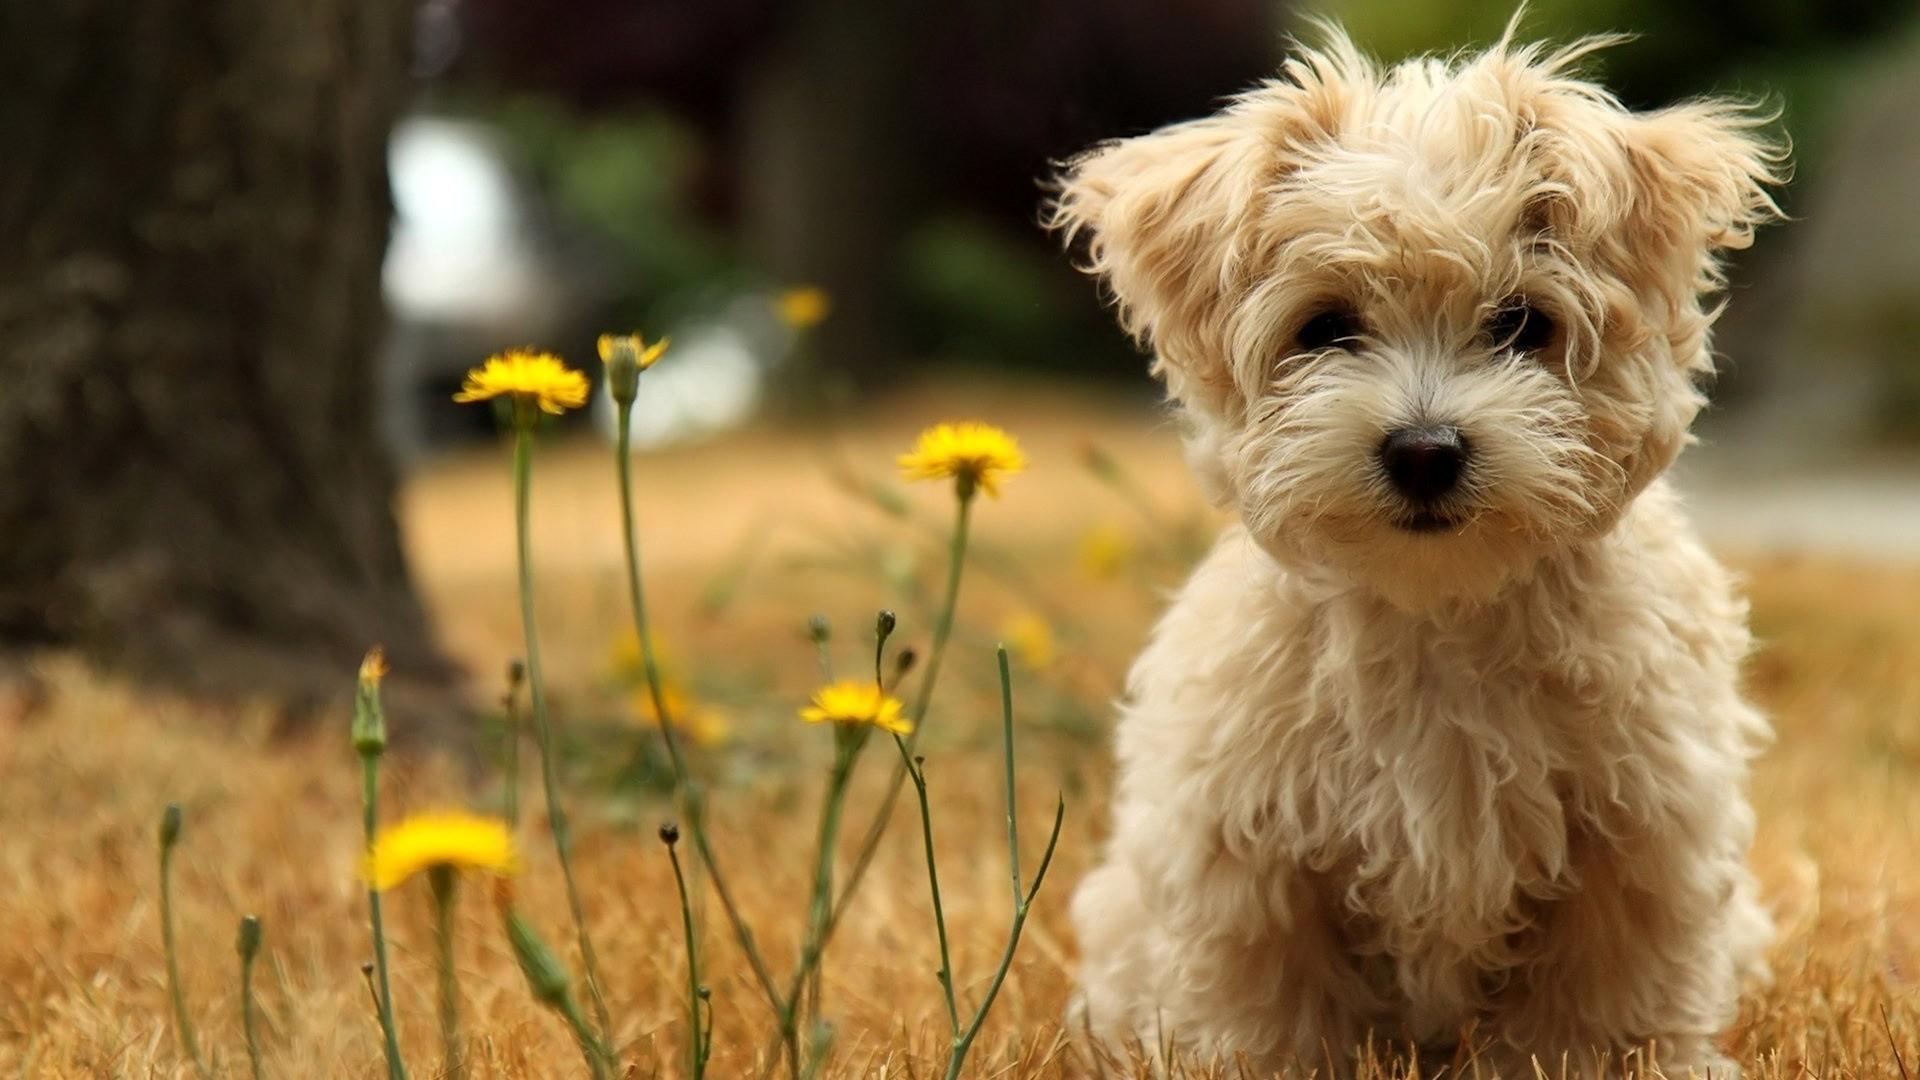 10 best puppies wallpaper for desktop full hd 1080p for pc desktop